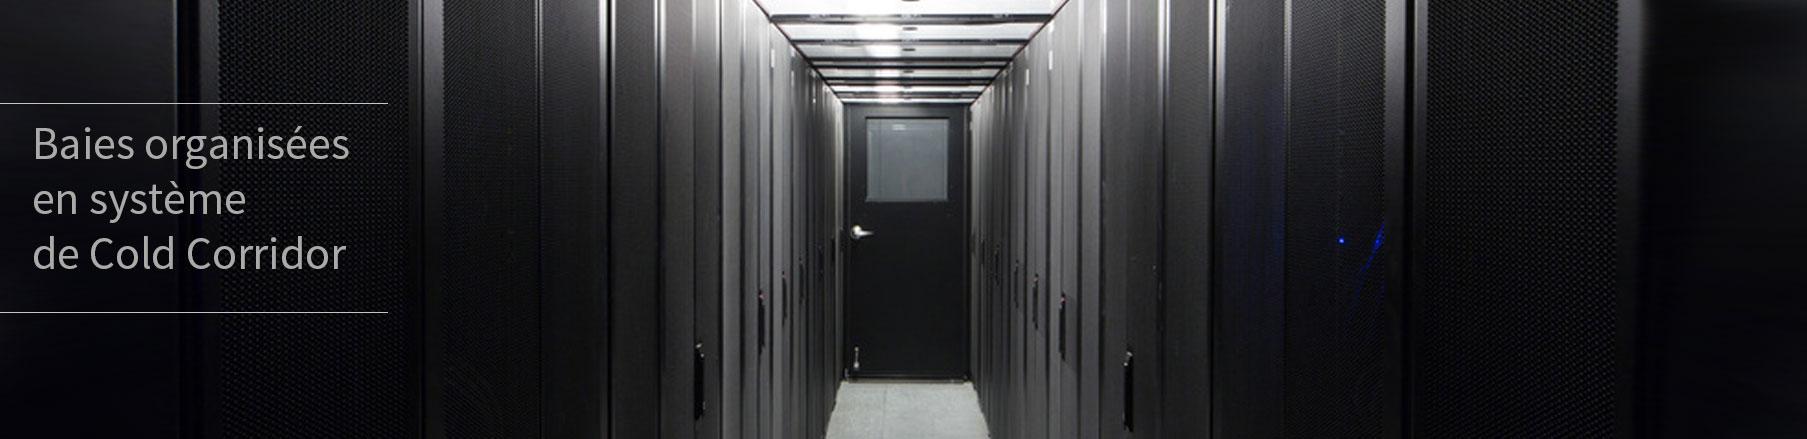 bandedatacenter